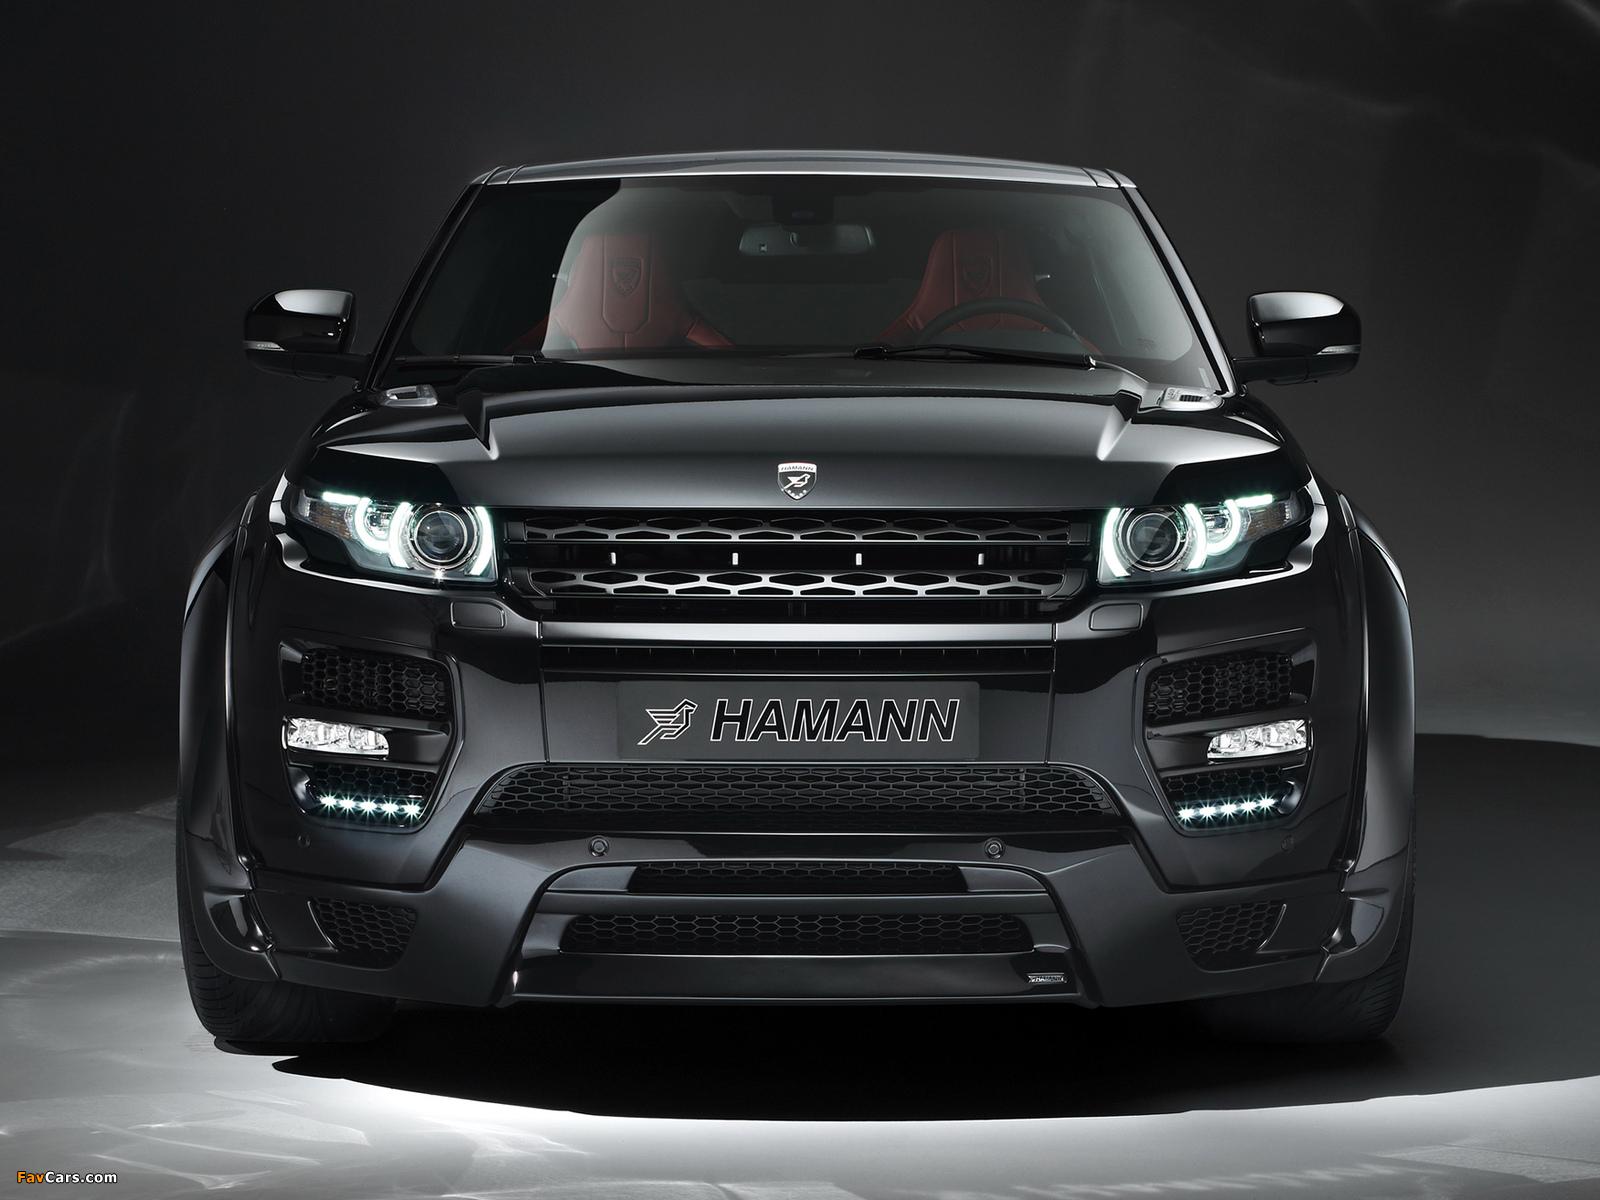 Hamann Range Rover Evoque Coupe 2012 images (1600 x 1200)